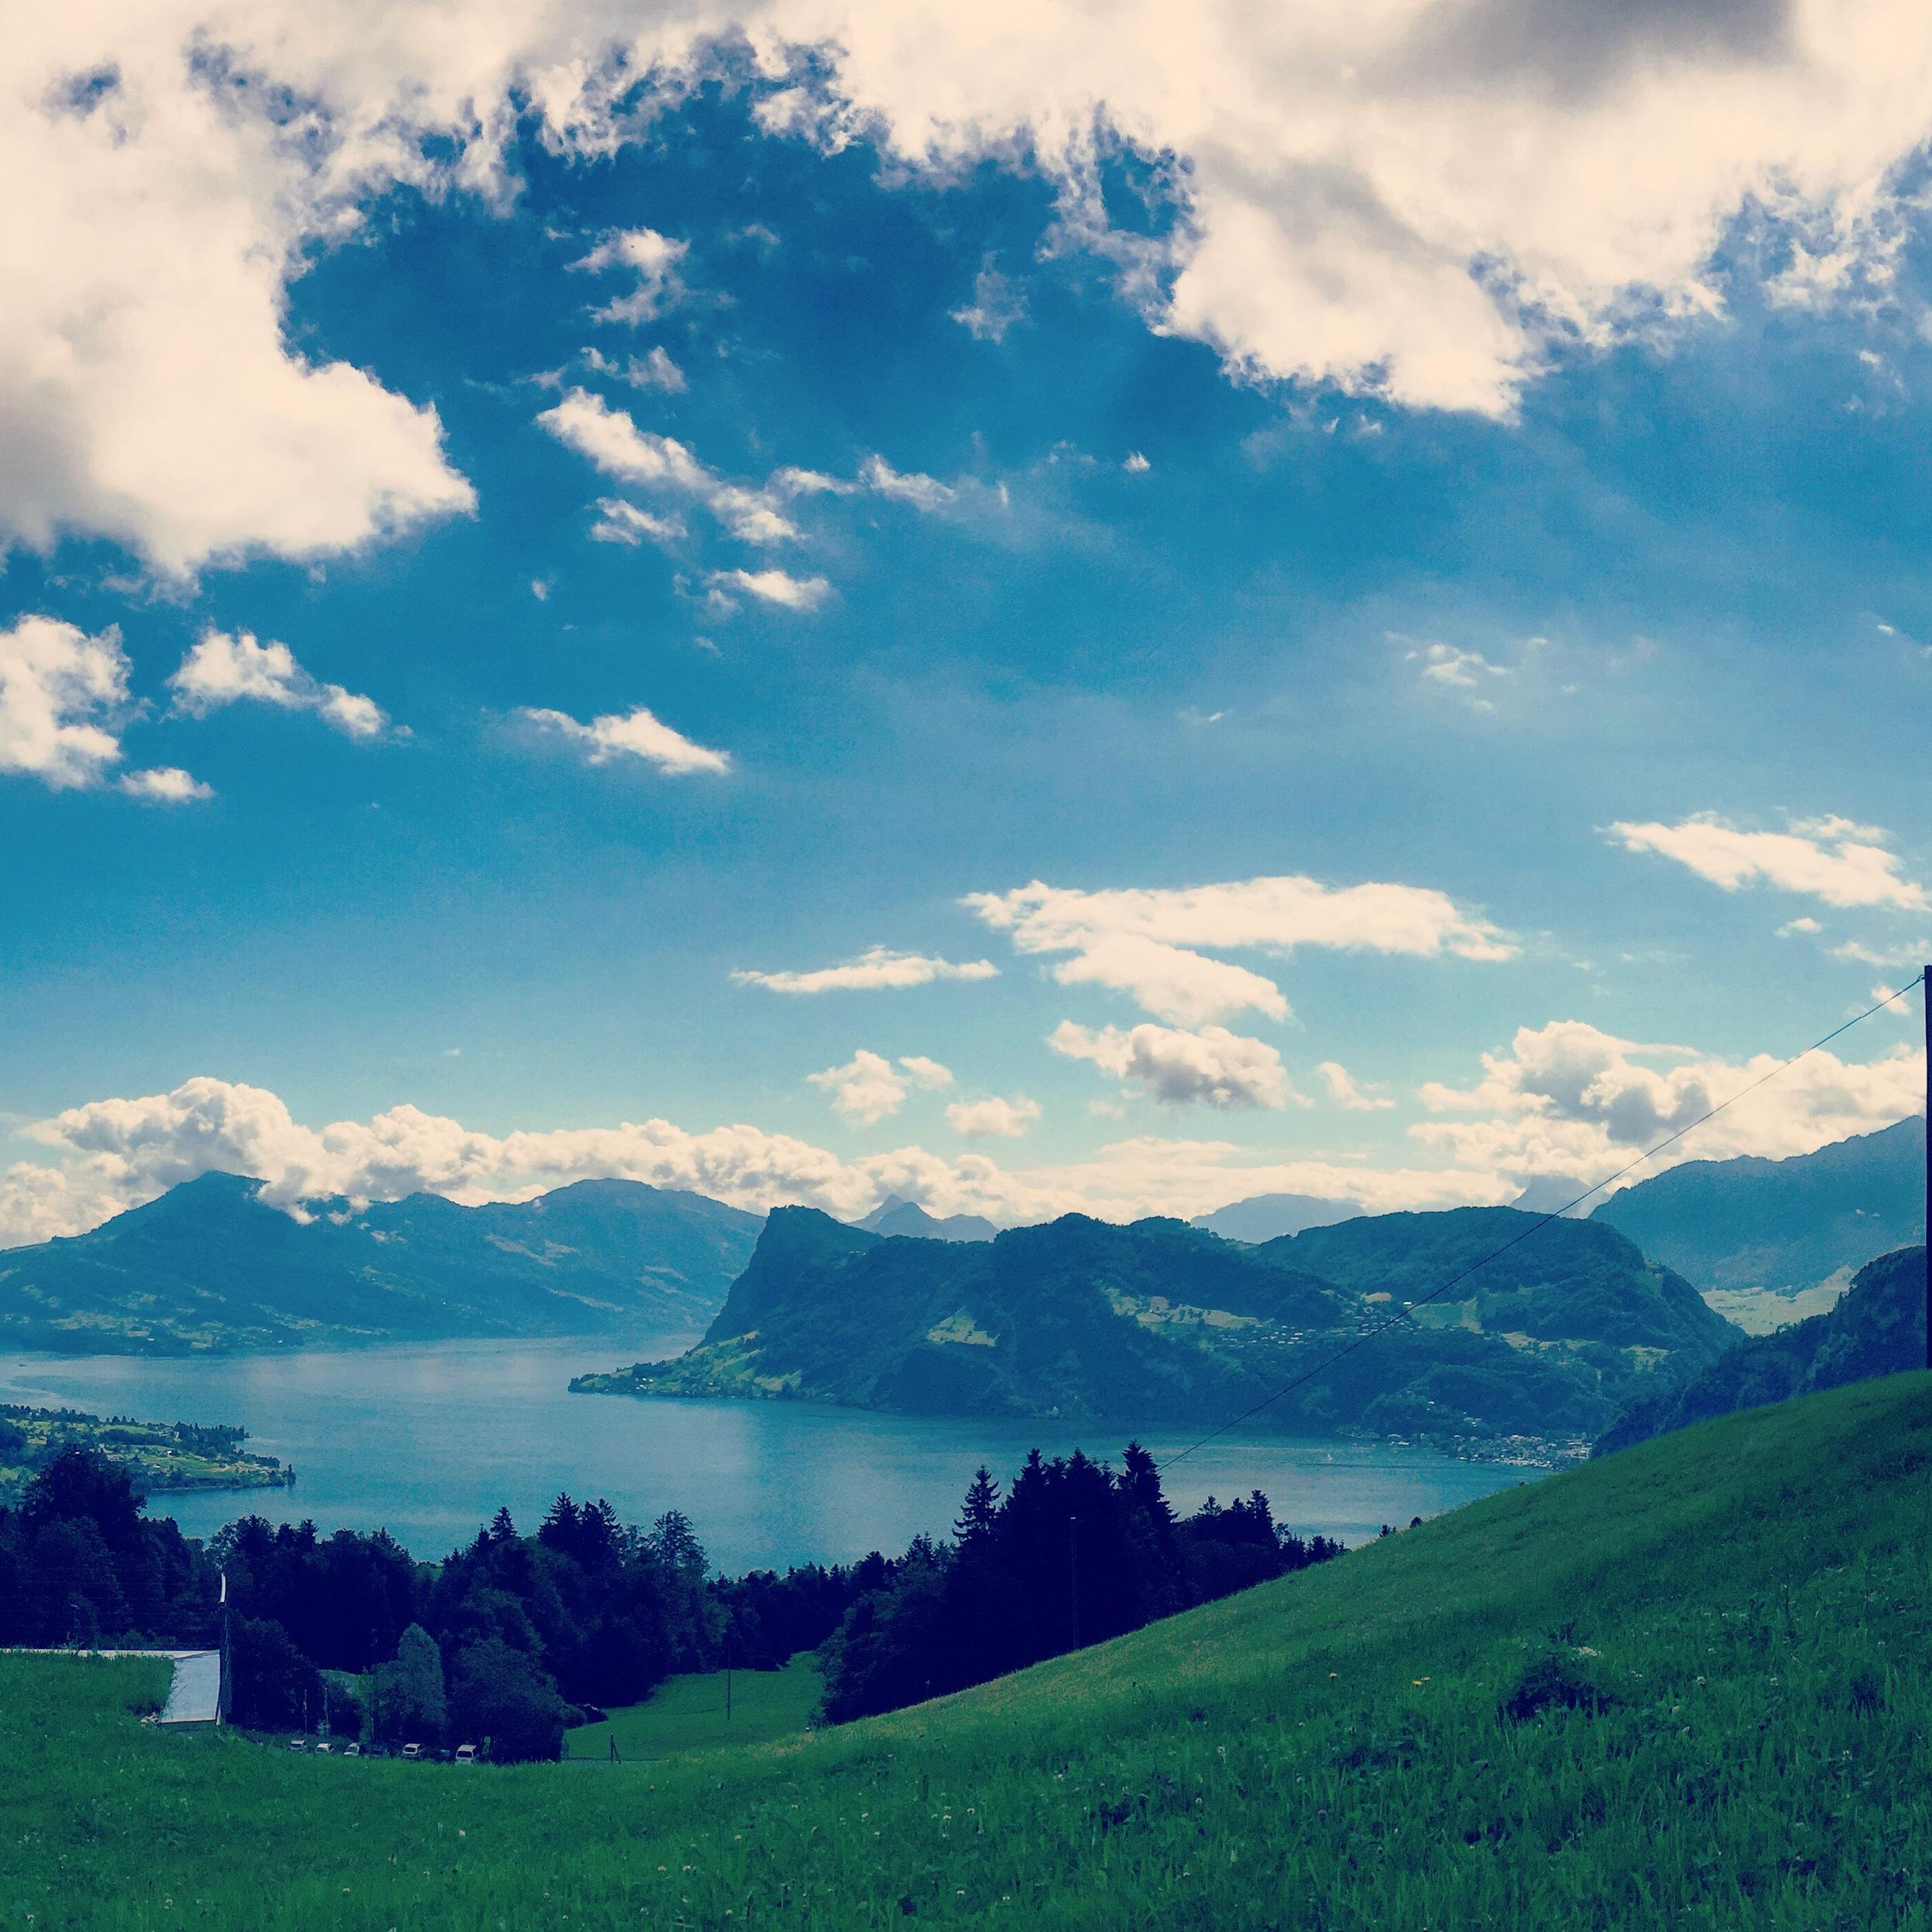 Hiking in Switzerland for my mom's 60th birthday